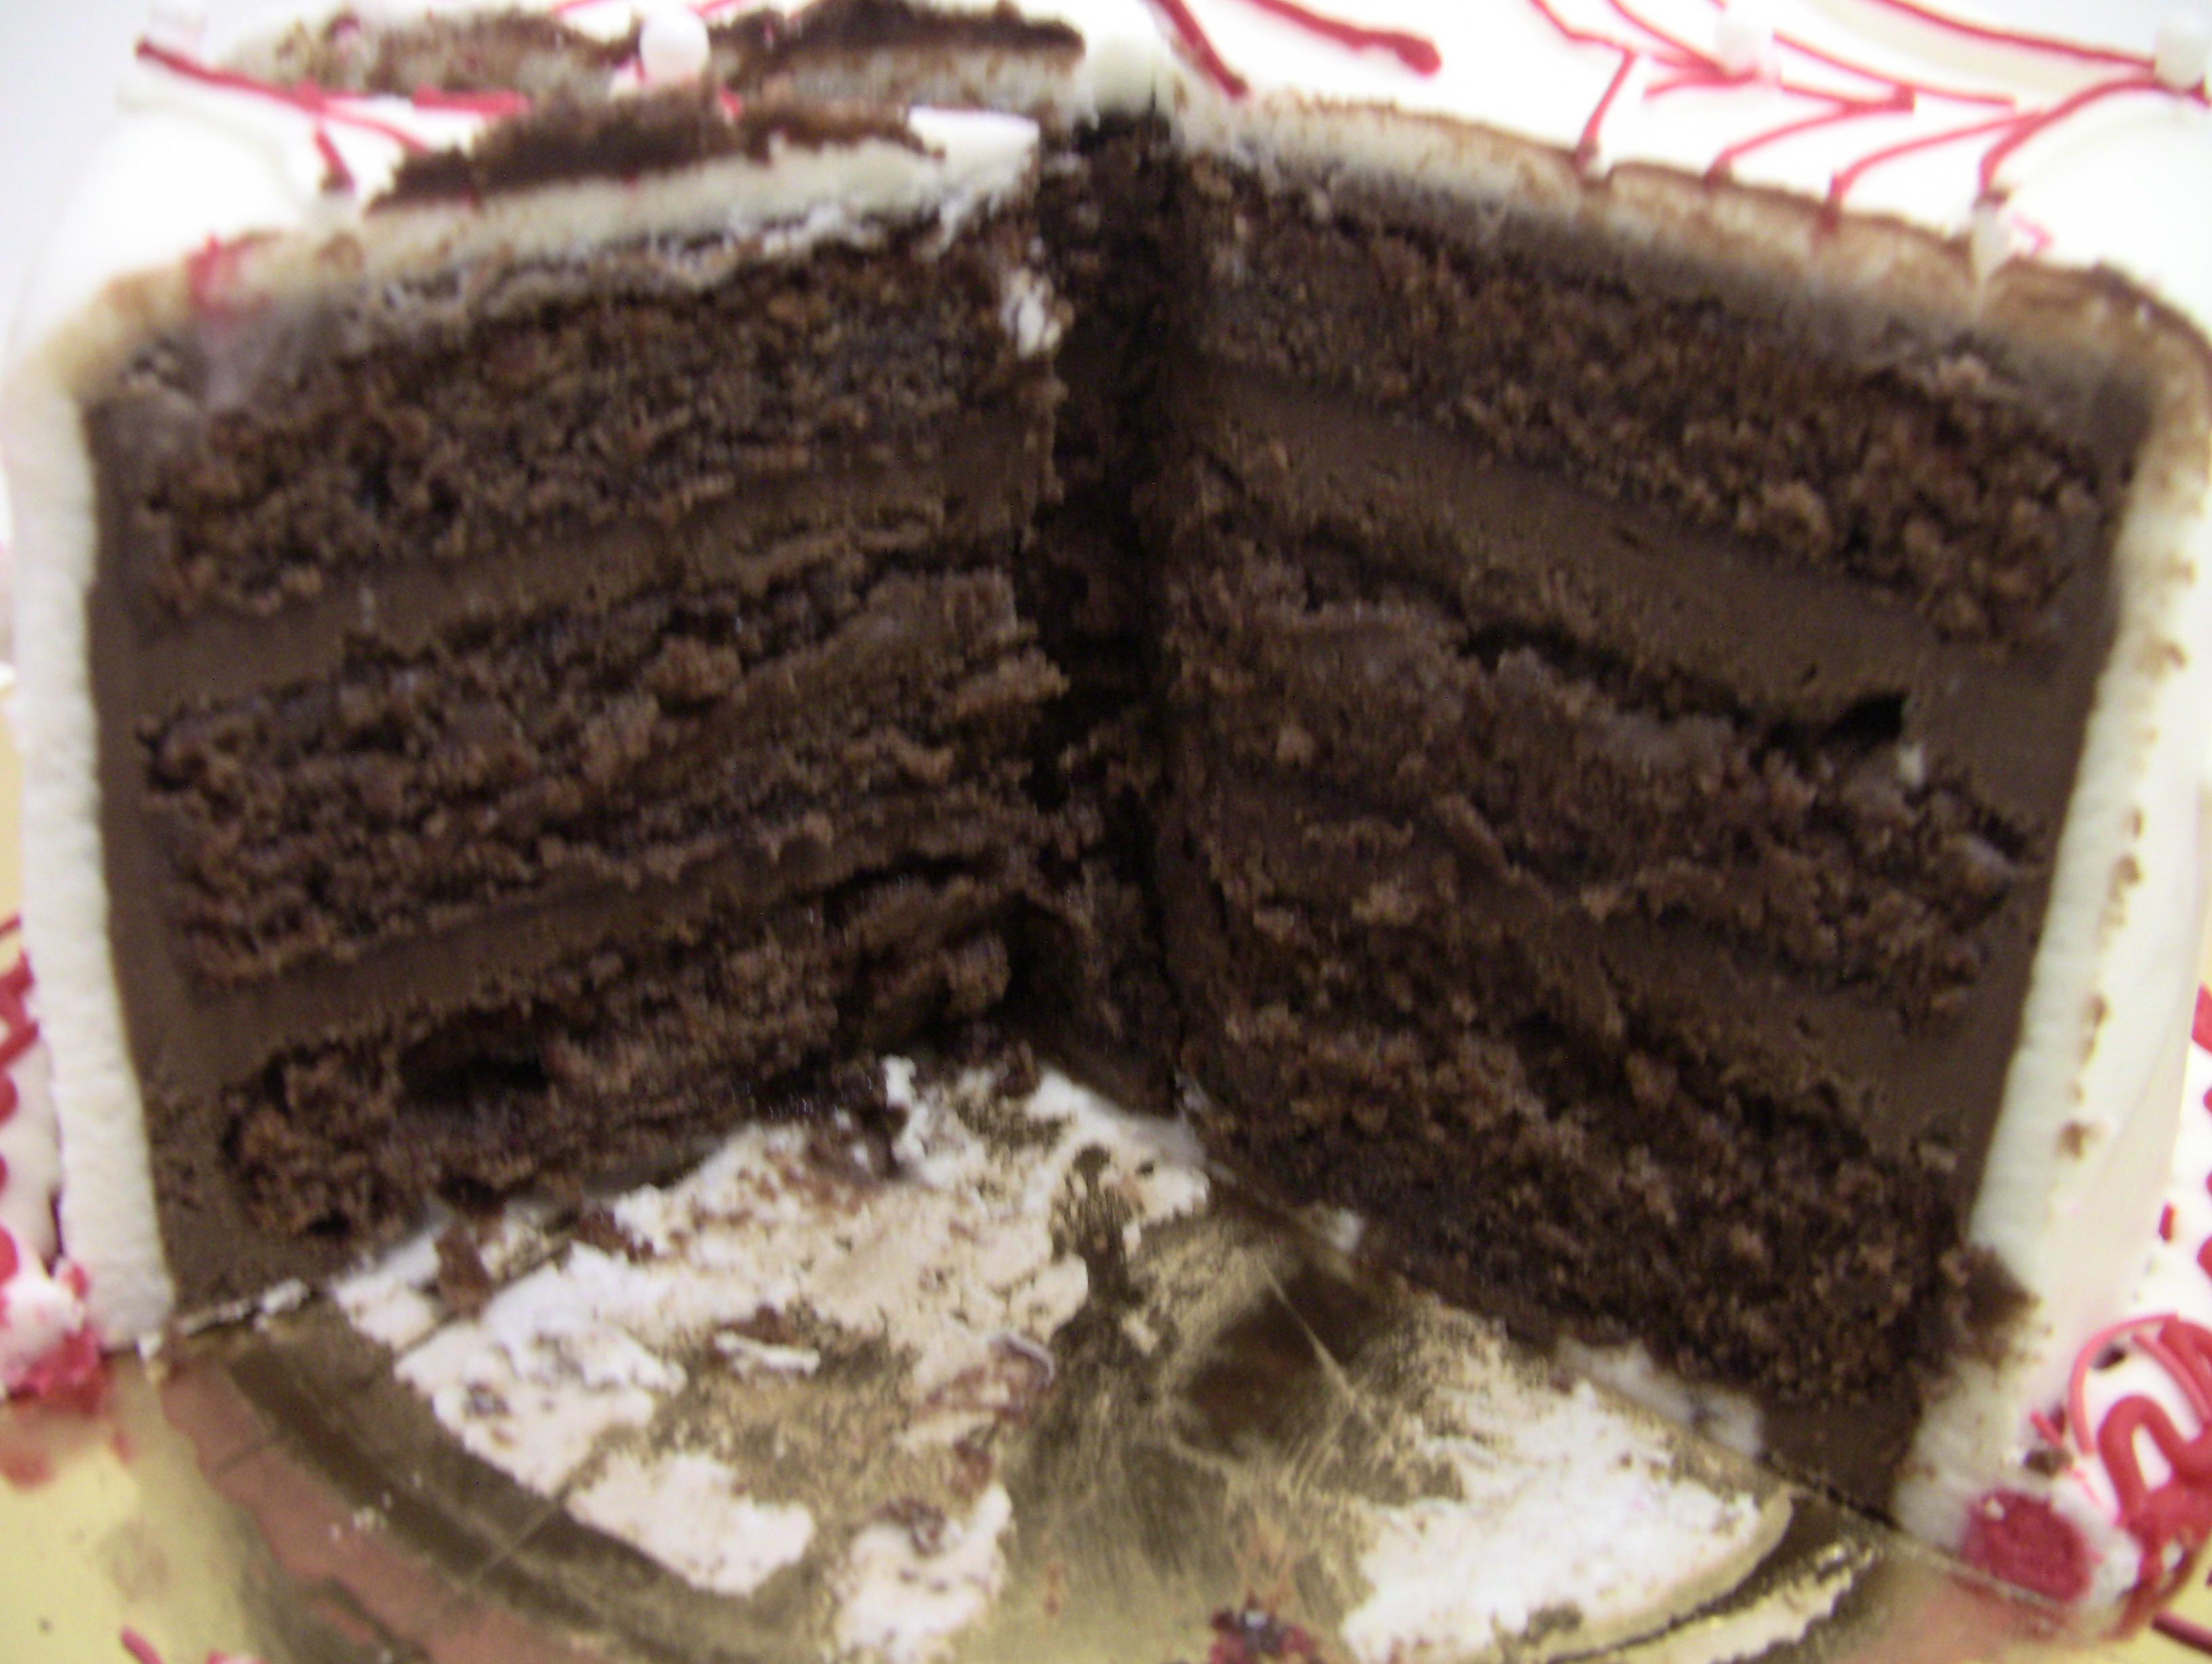 Double Chocolate Chocolate Cake